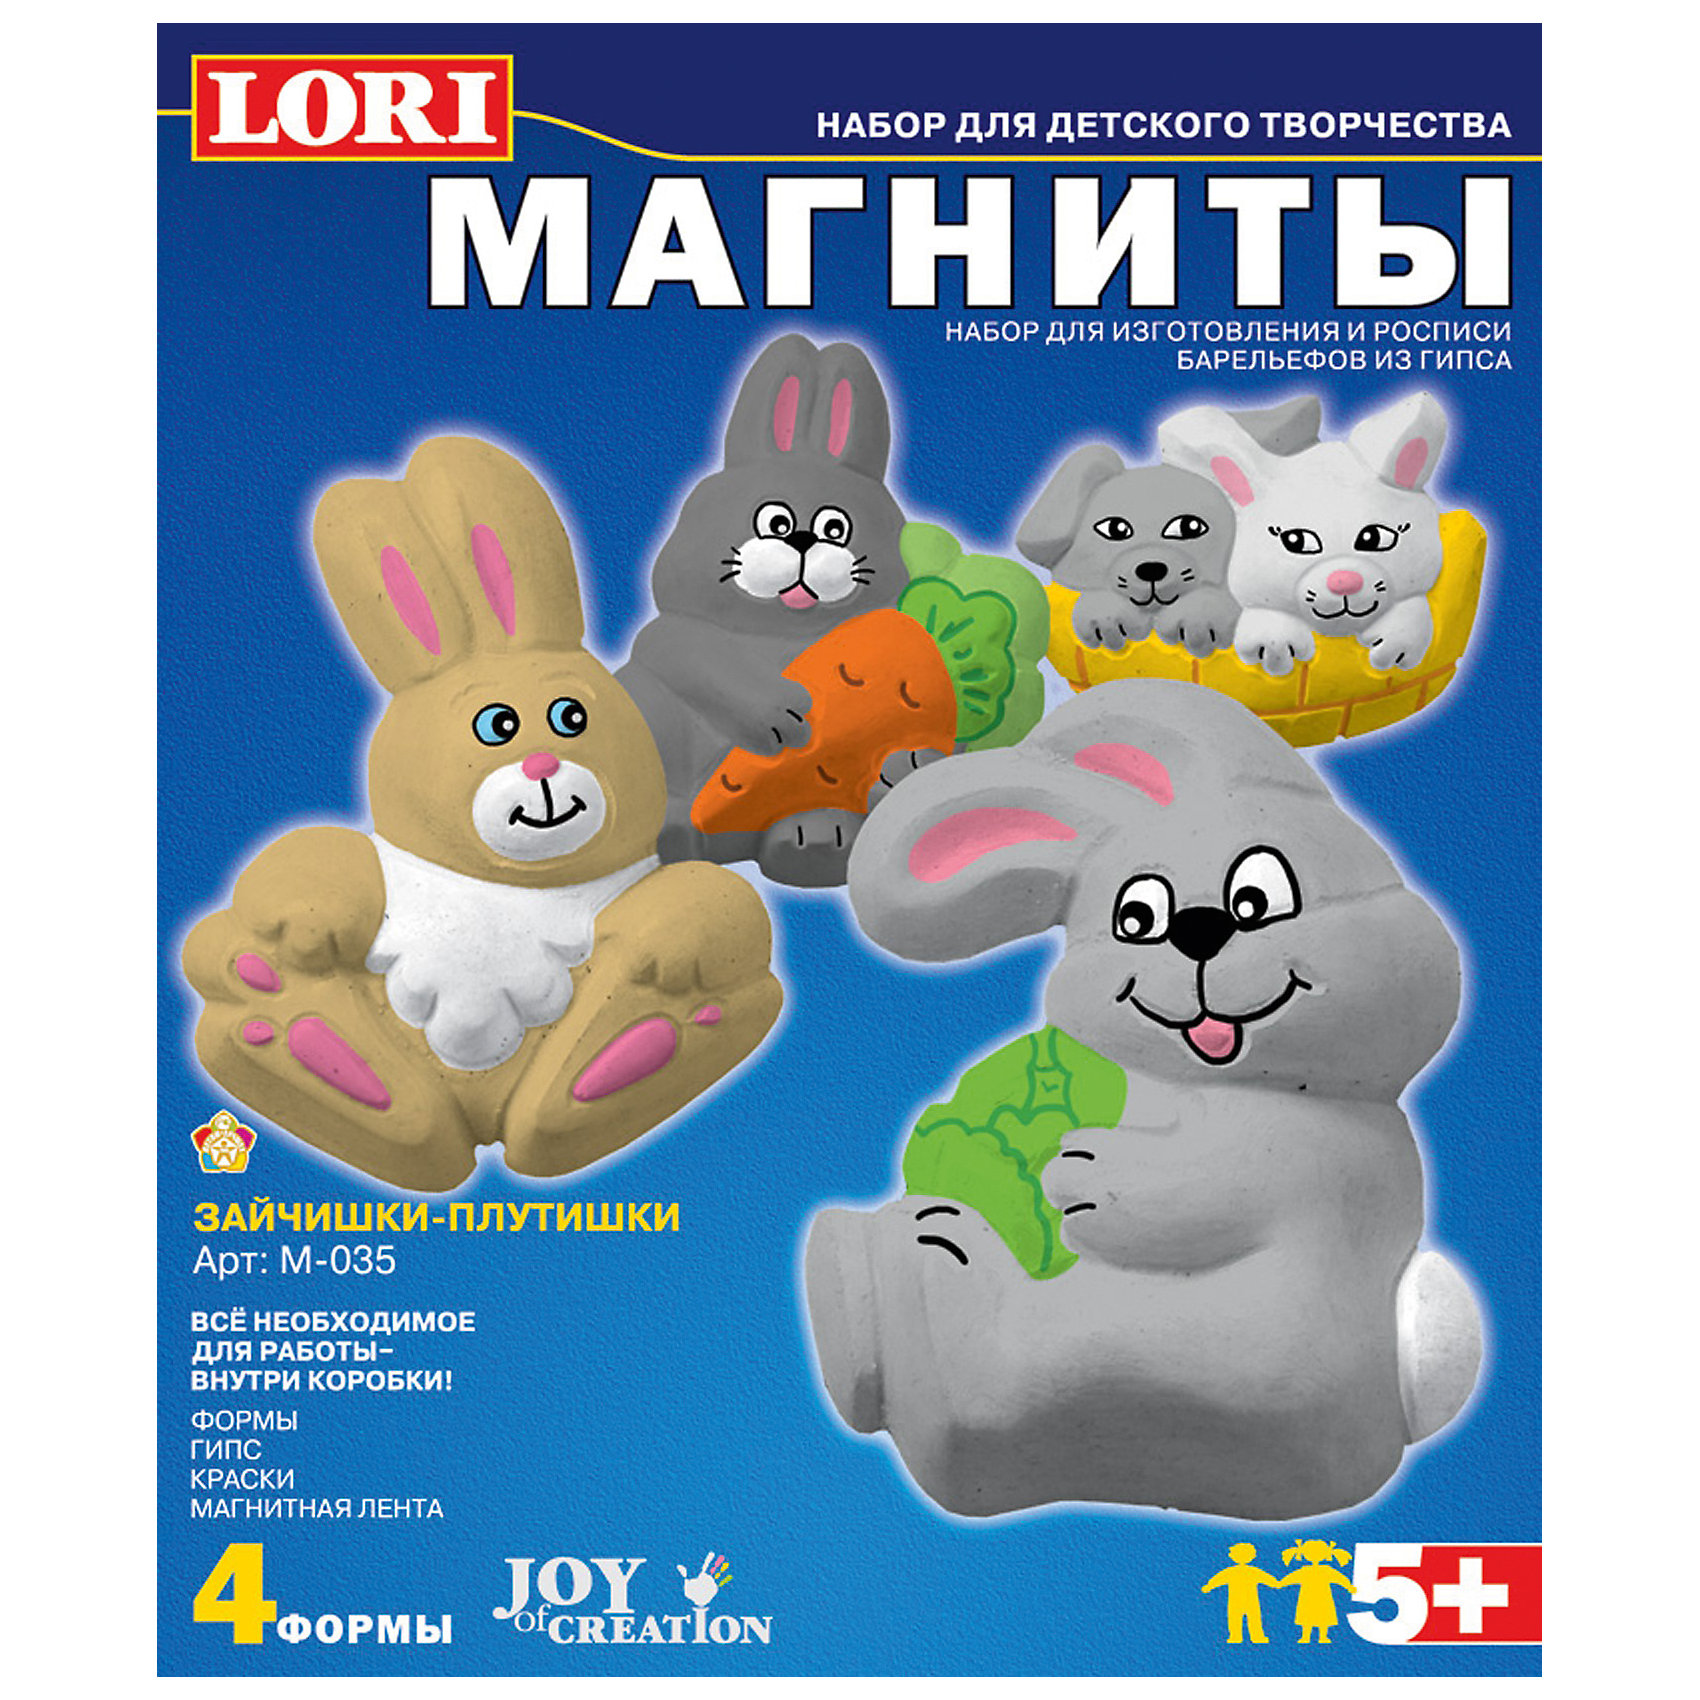 Фигурки на магнитах «Зайчишки-плутишки»